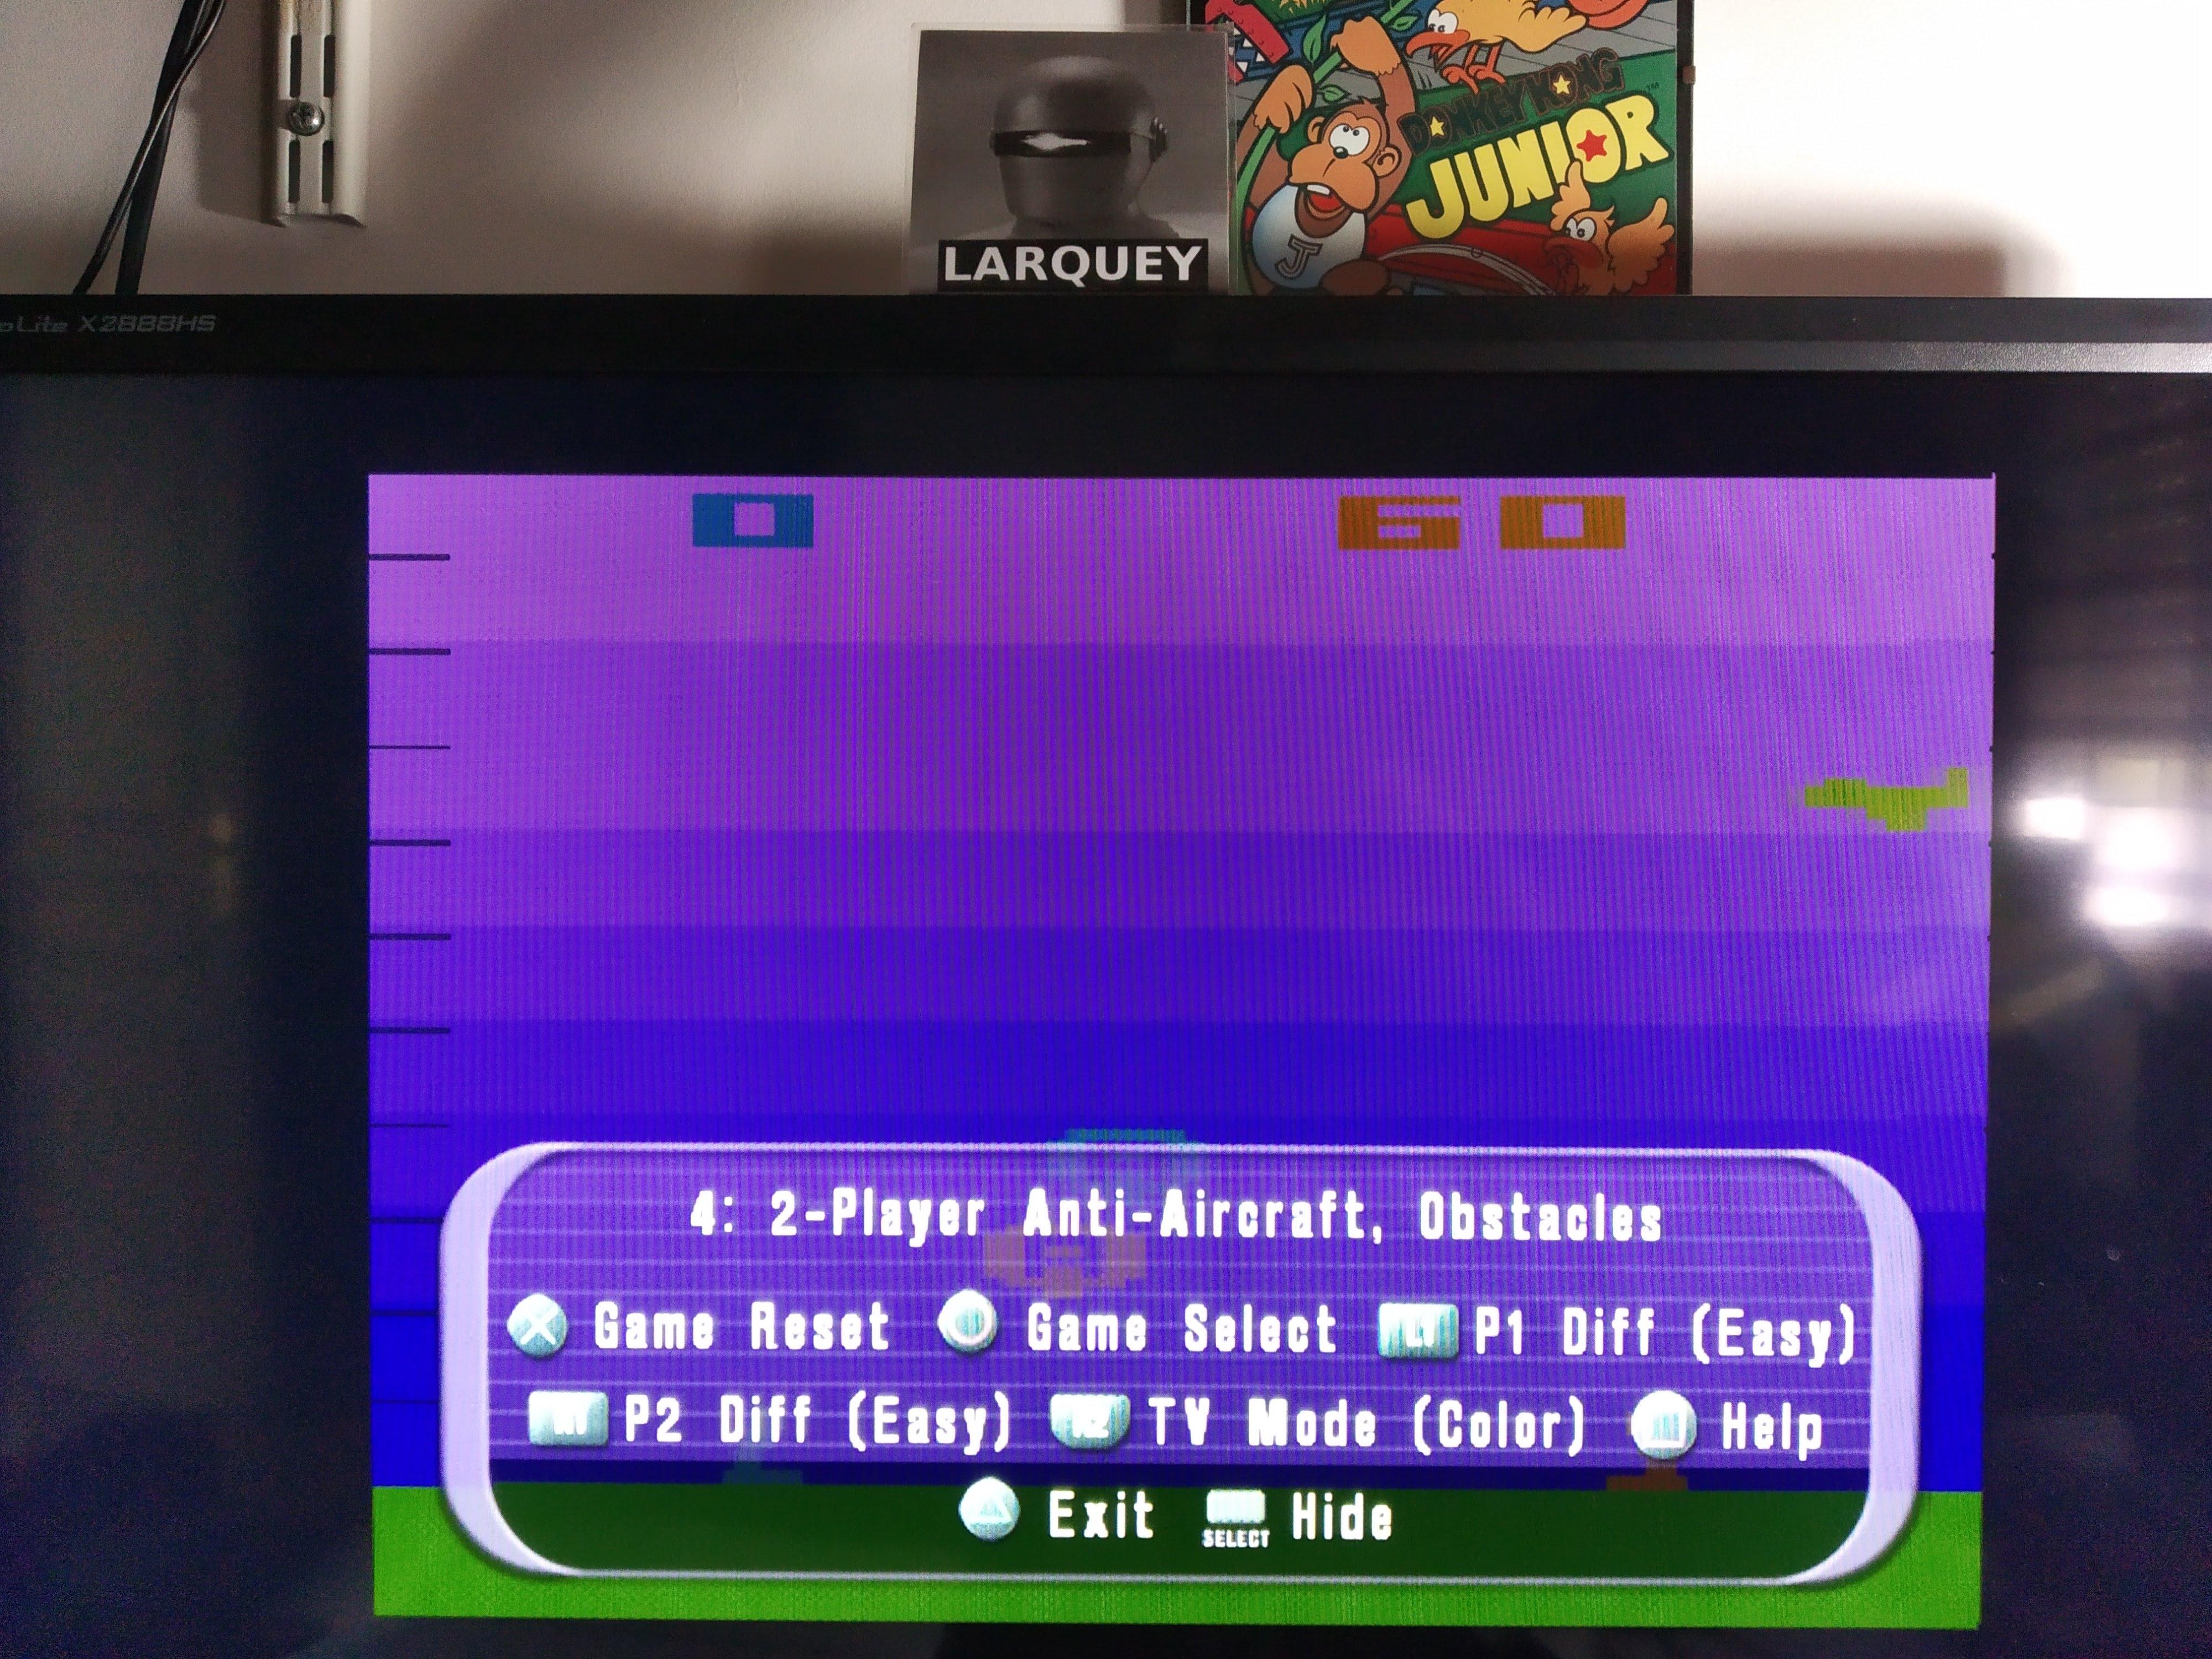 Larquey: Atari Anthology: Air-Sea Battle [Game 4B] (Playstation 2 Emulated) 60 points on 2020-08-05 12:15:56